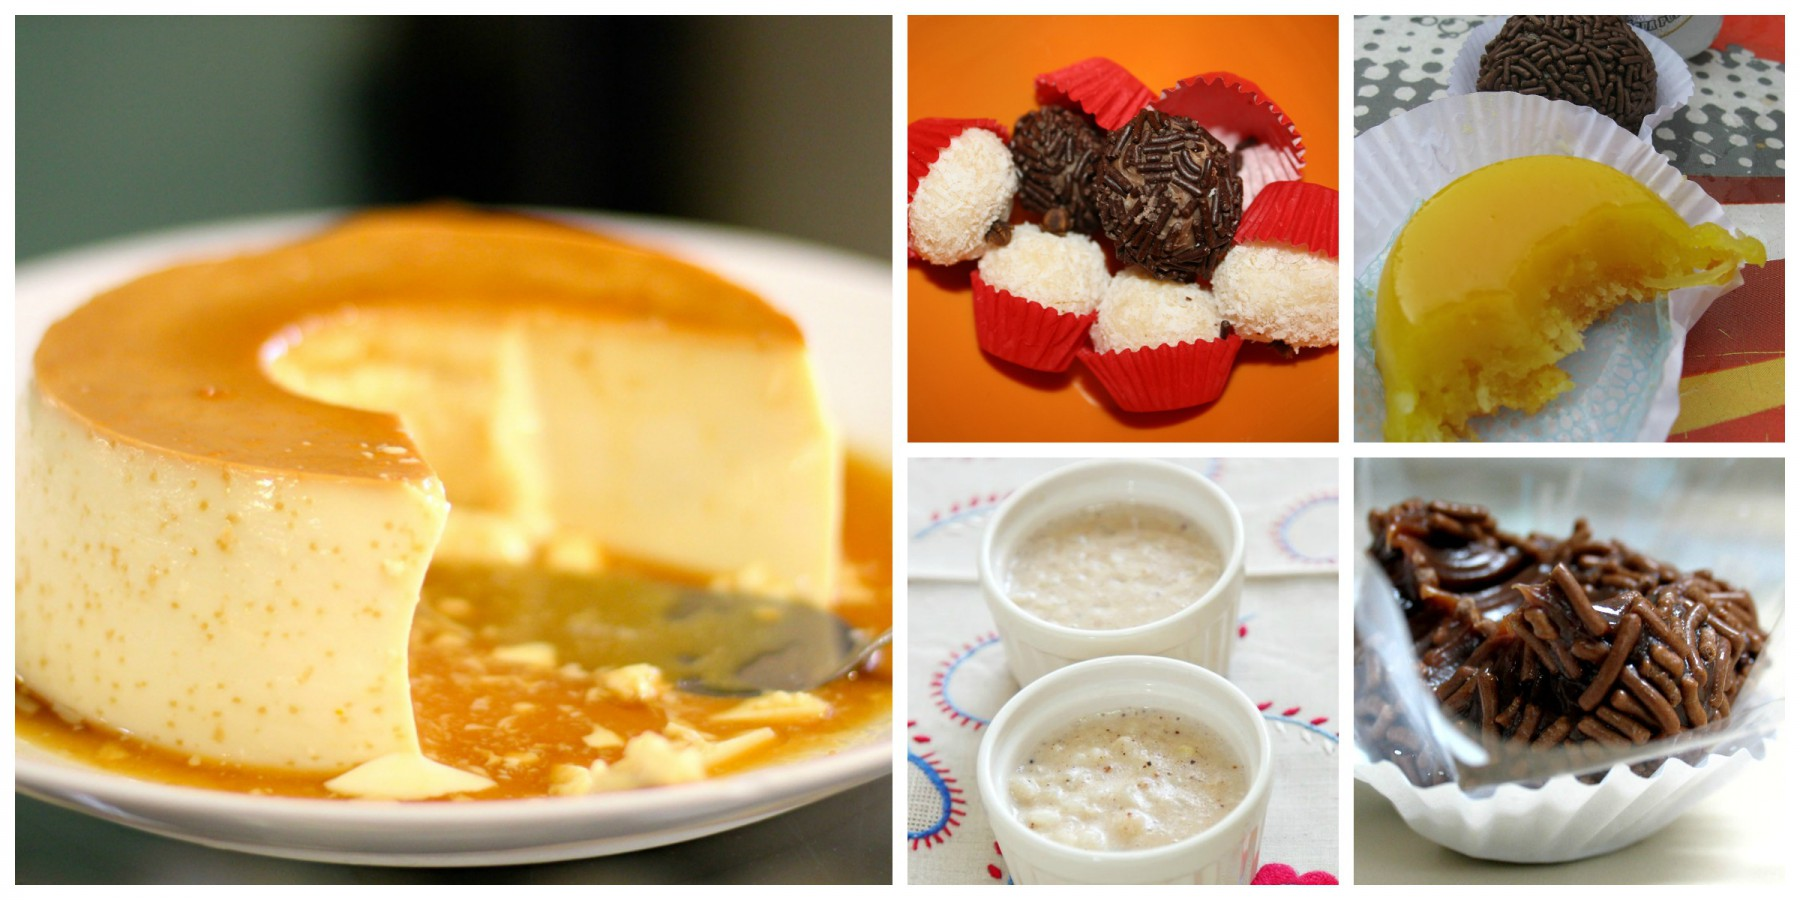 Délicieux desserts brésiliens : quindim, brigadeiros, beijinhos de coco, pudim de leite